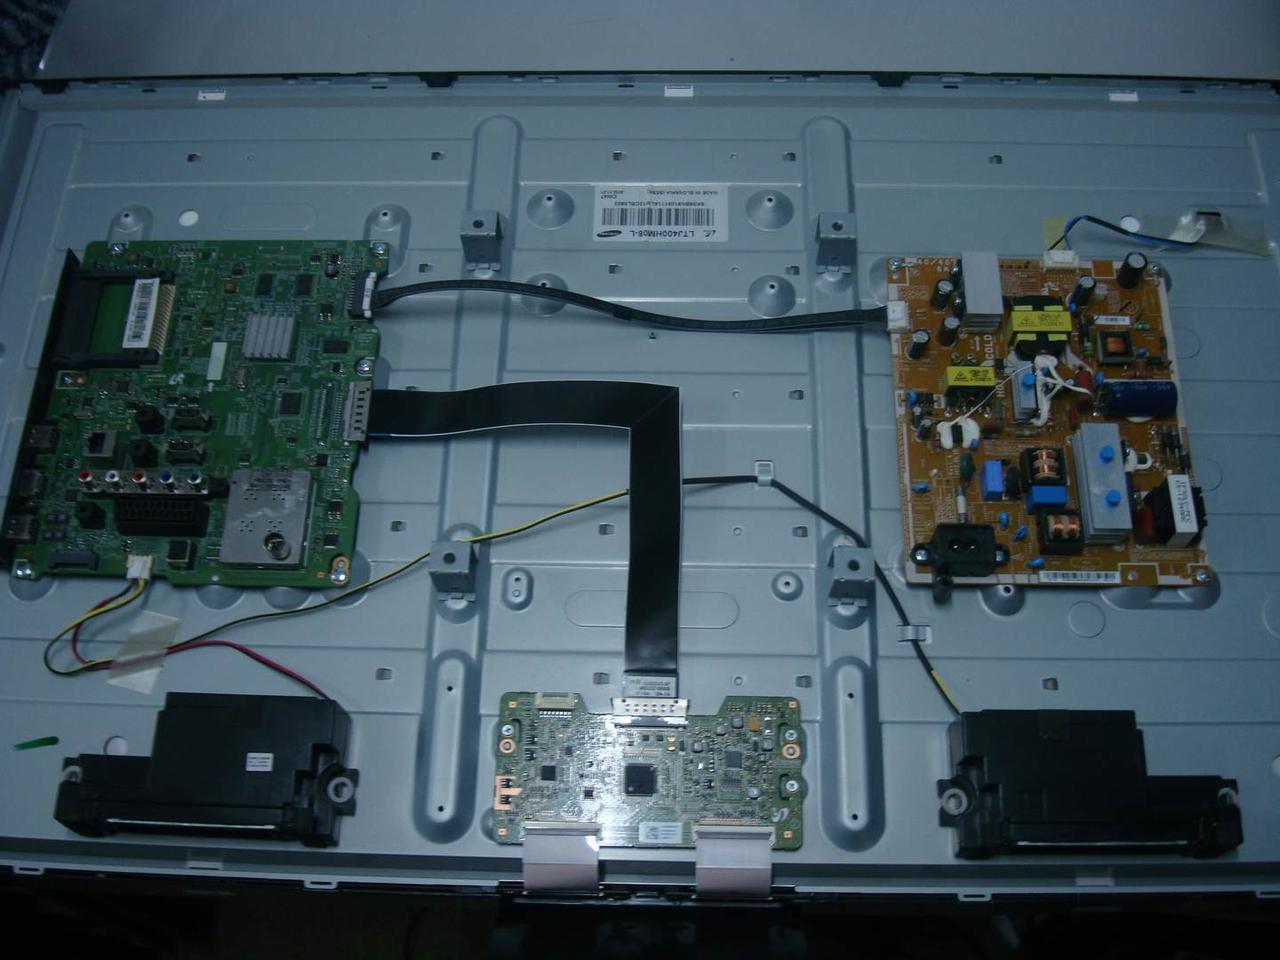 Запчасти к телевизору Samsung UE40EH5307 (LSJ400HM05-E08, BN41-01797A, BN44-0498A)